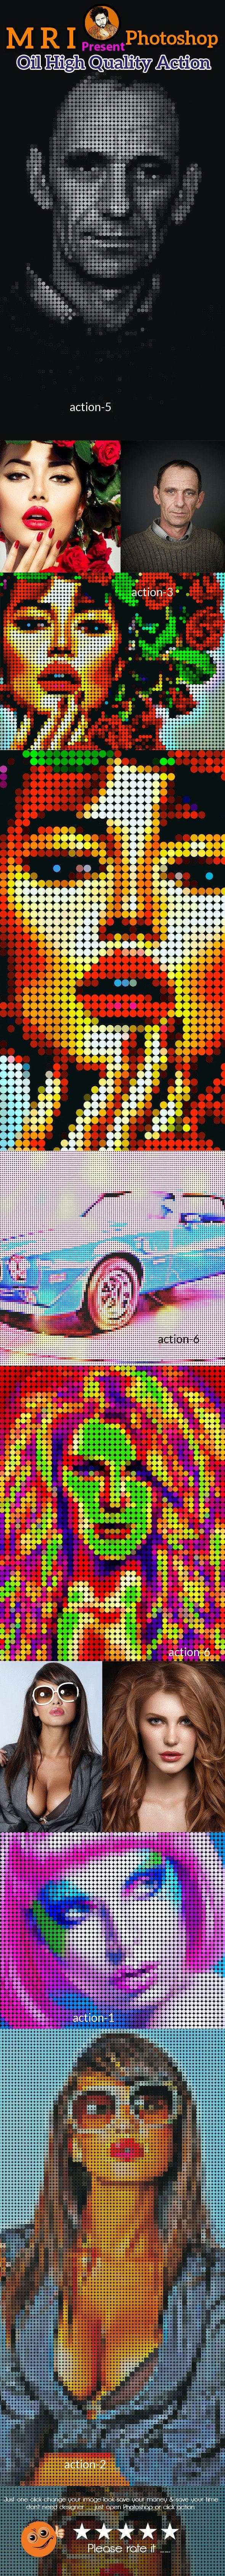 Pixel Art Revelation Action - Actions Photoshop